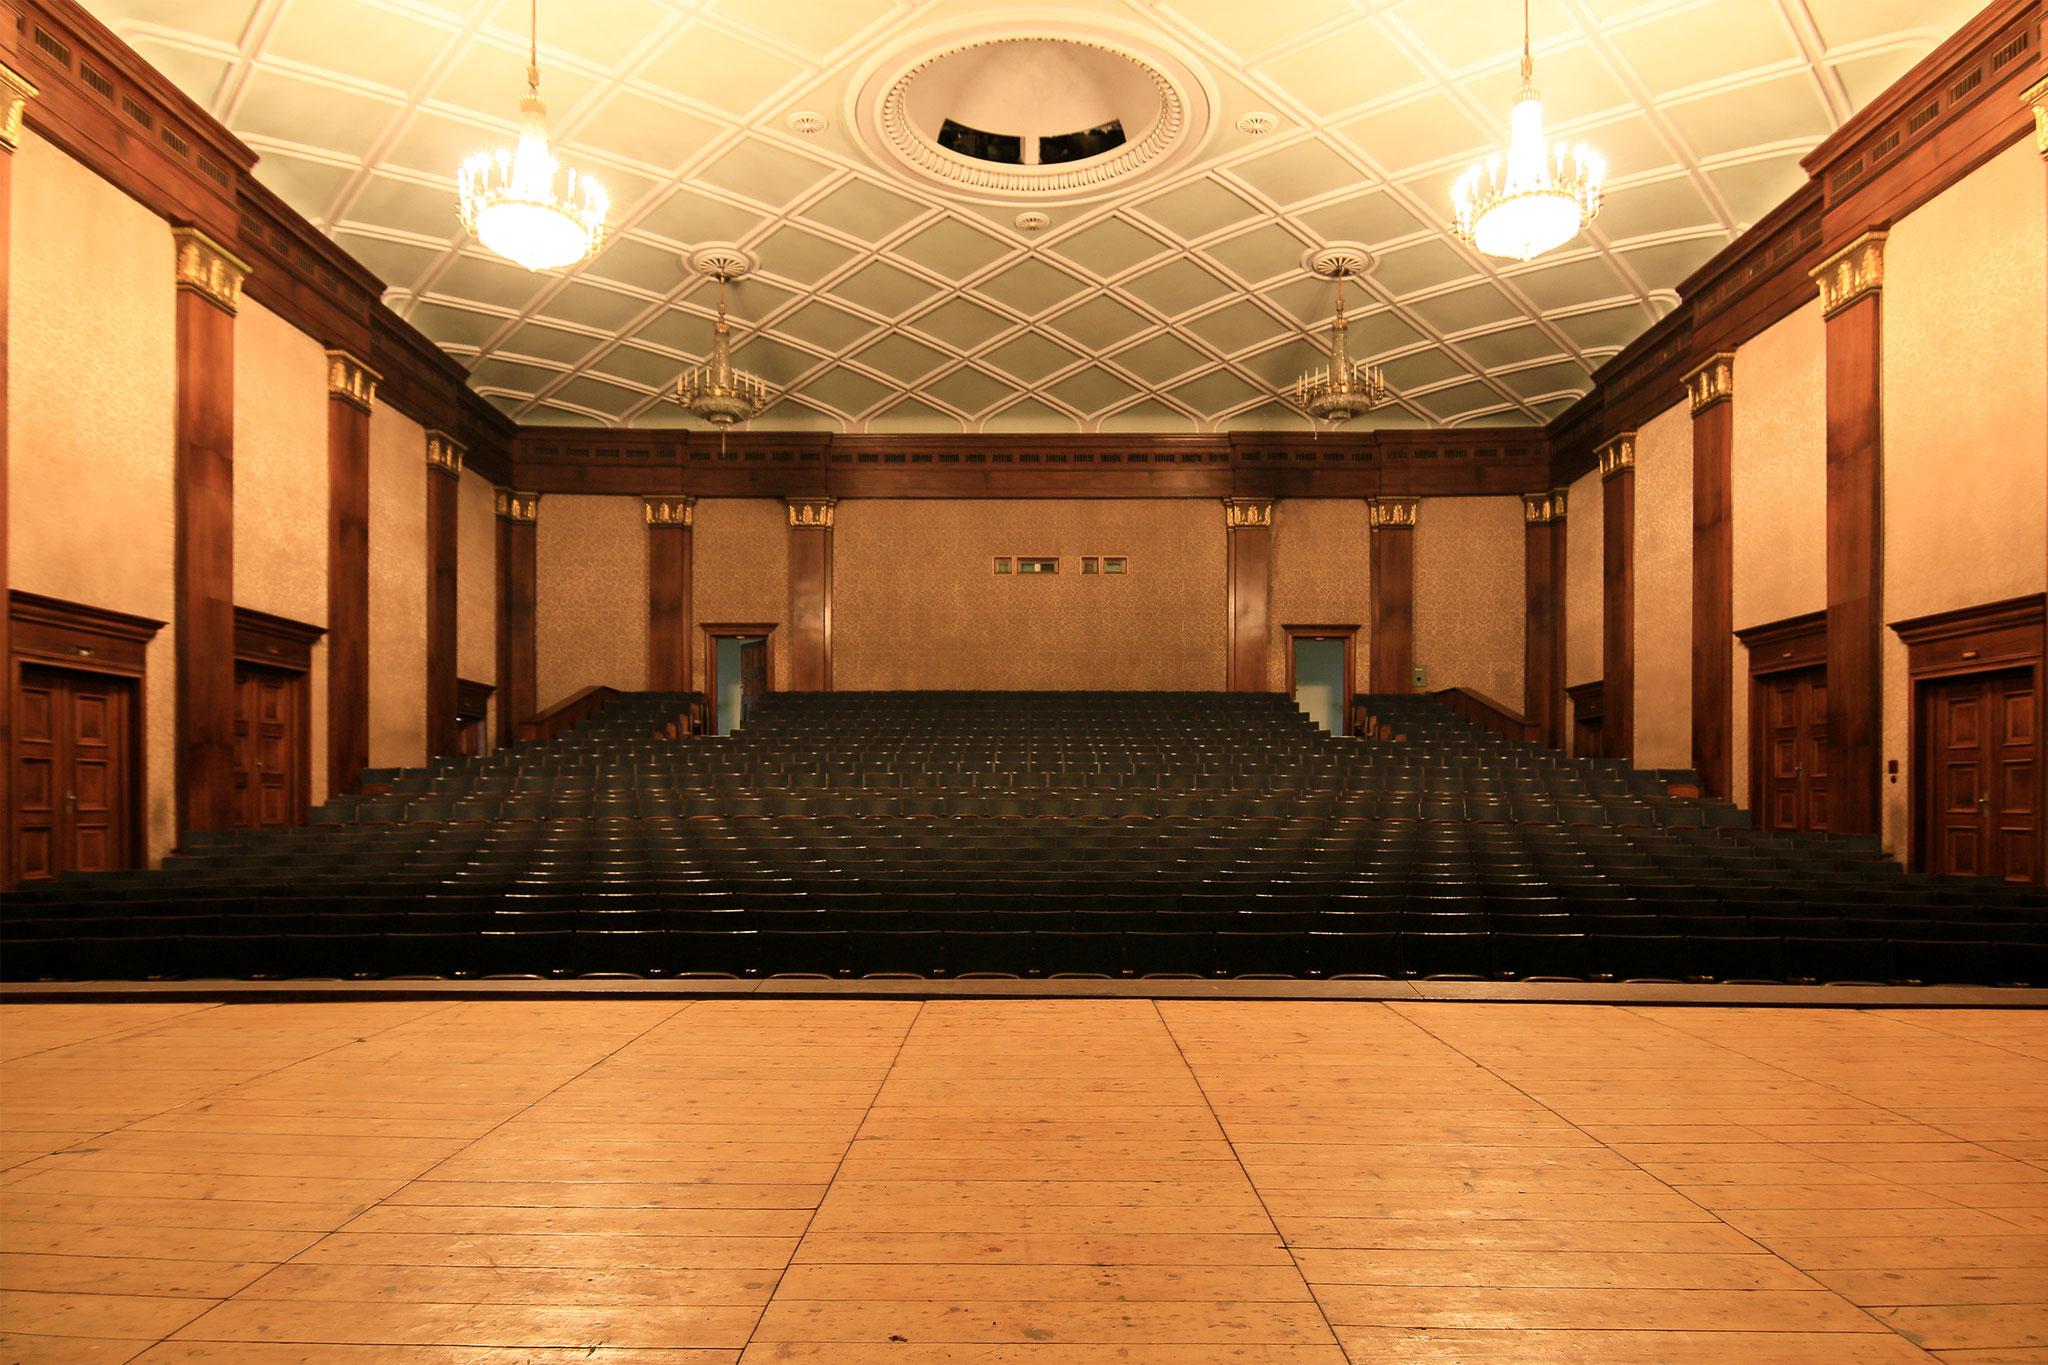 Festsaal des Kulturpalast Unterwellenborn